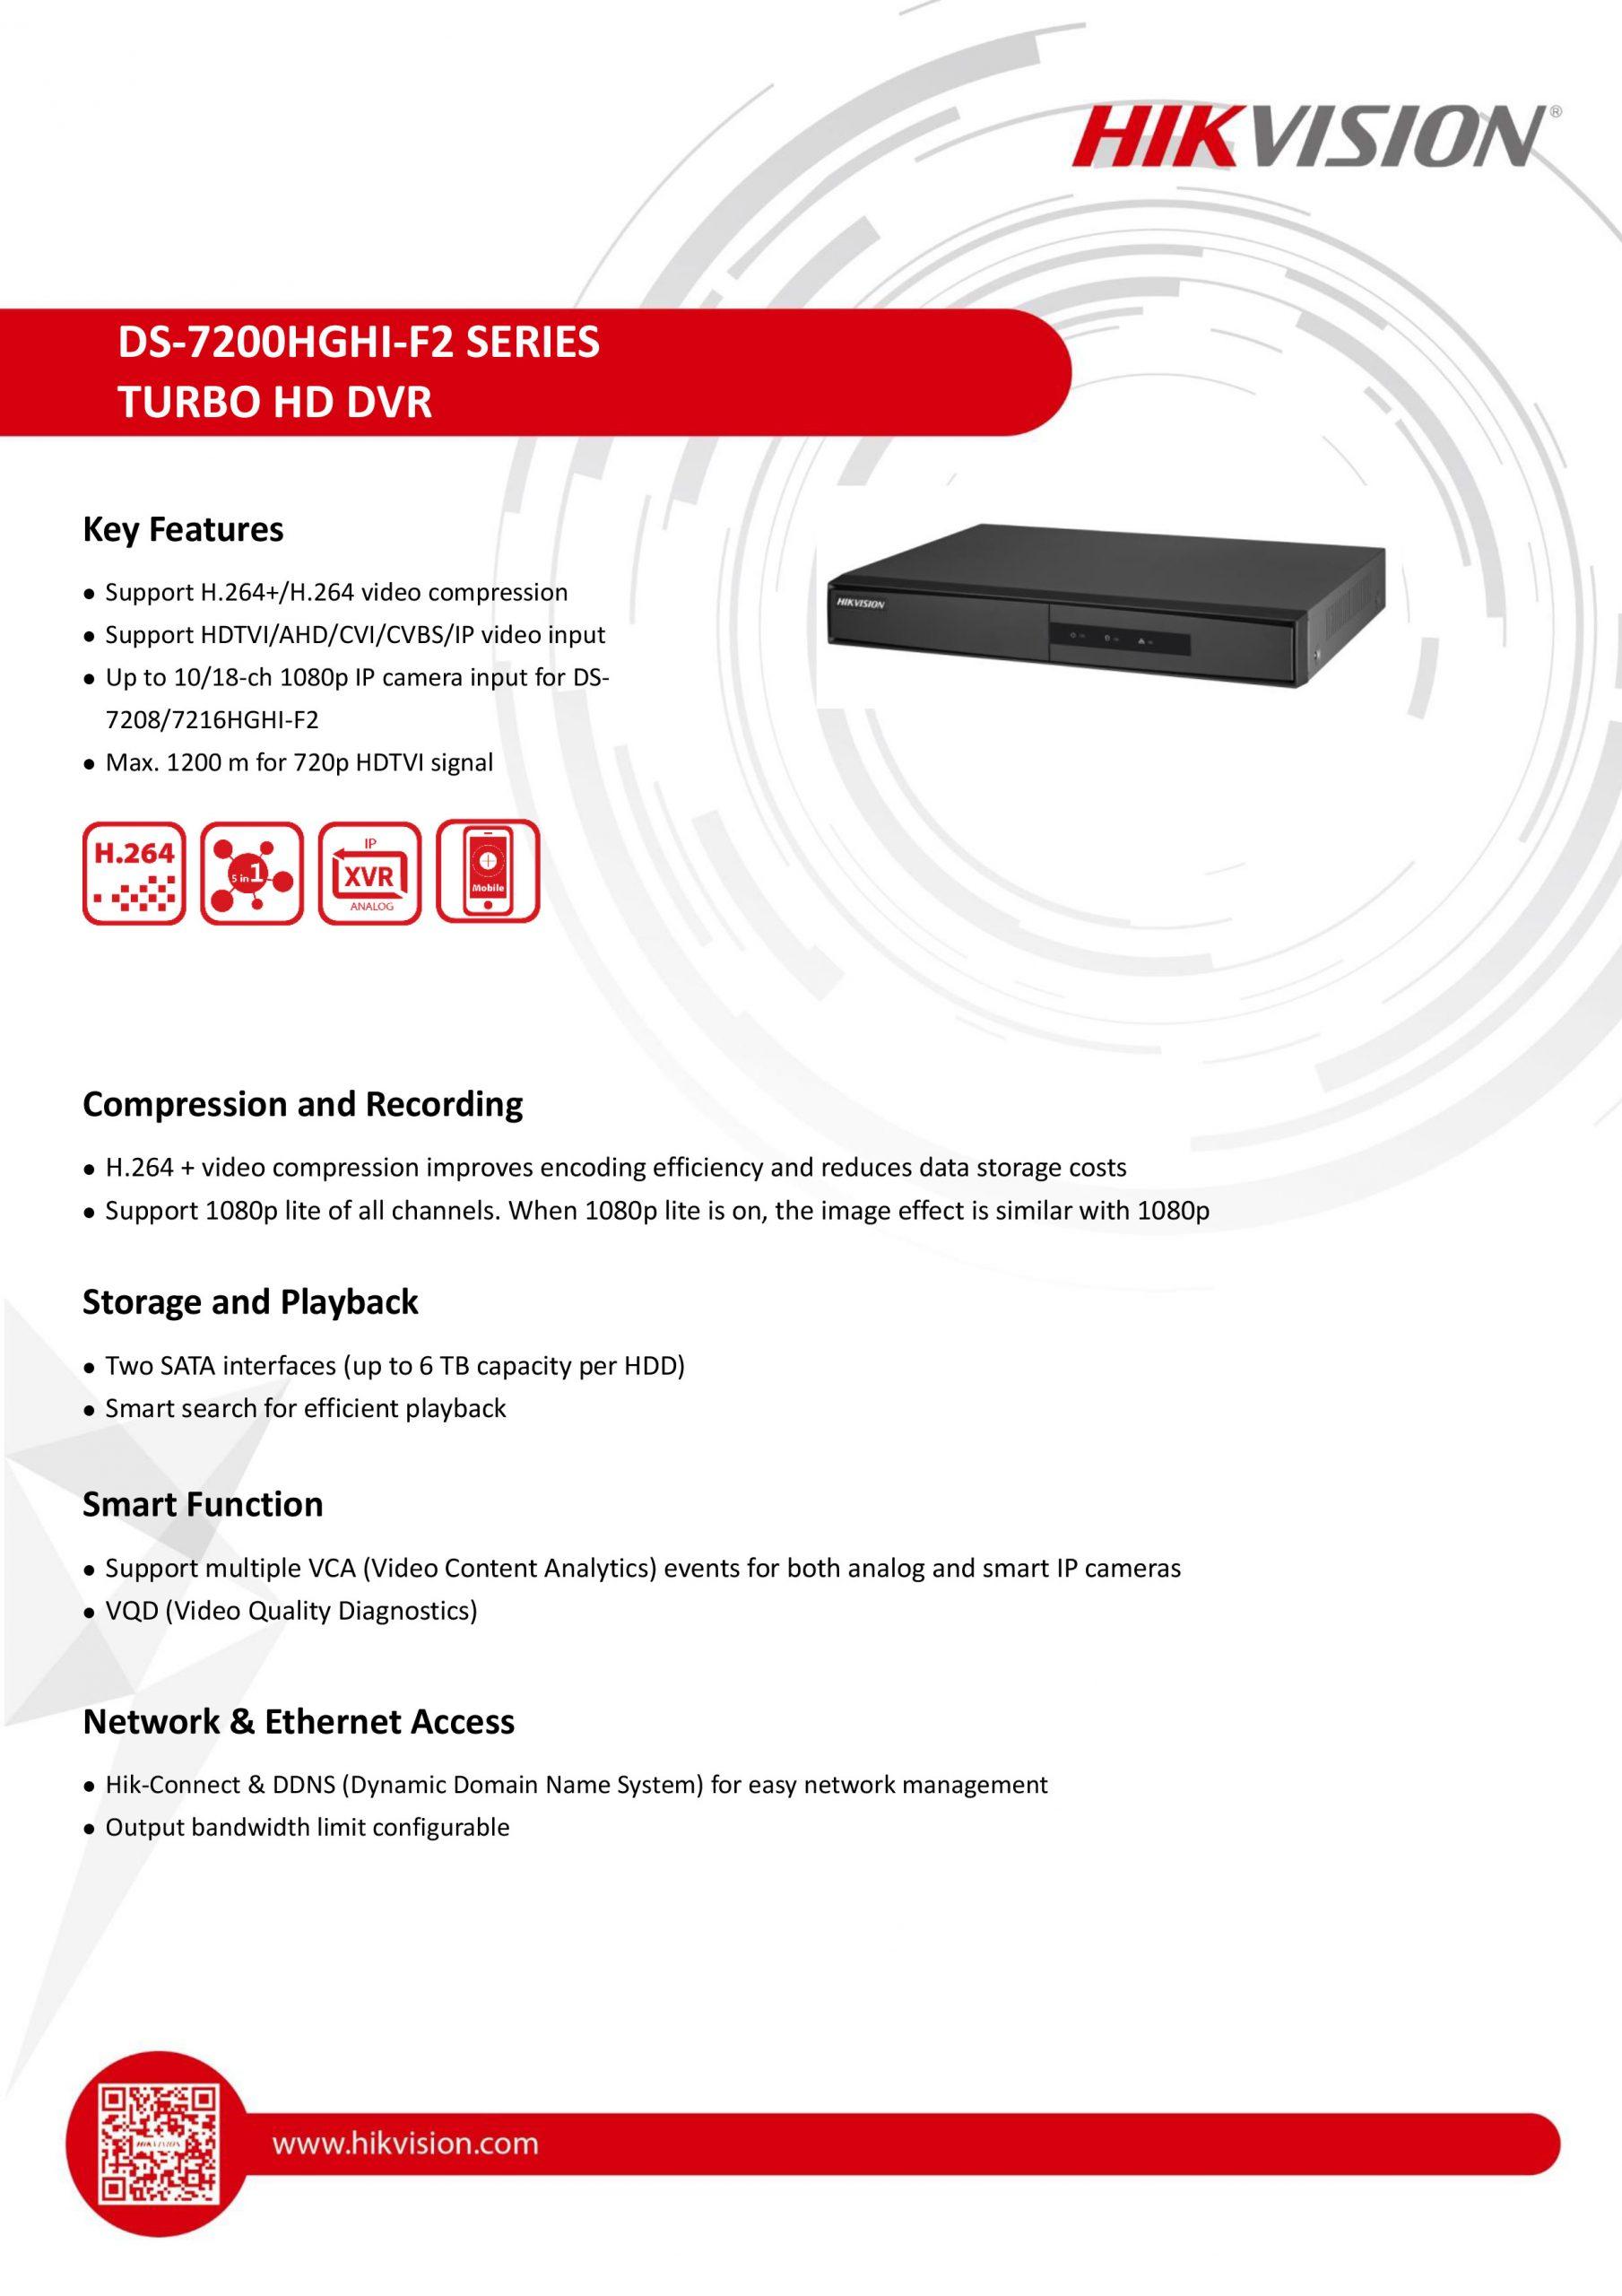 Hikvision DS-7216HGHI-F2 8 Channel DVR